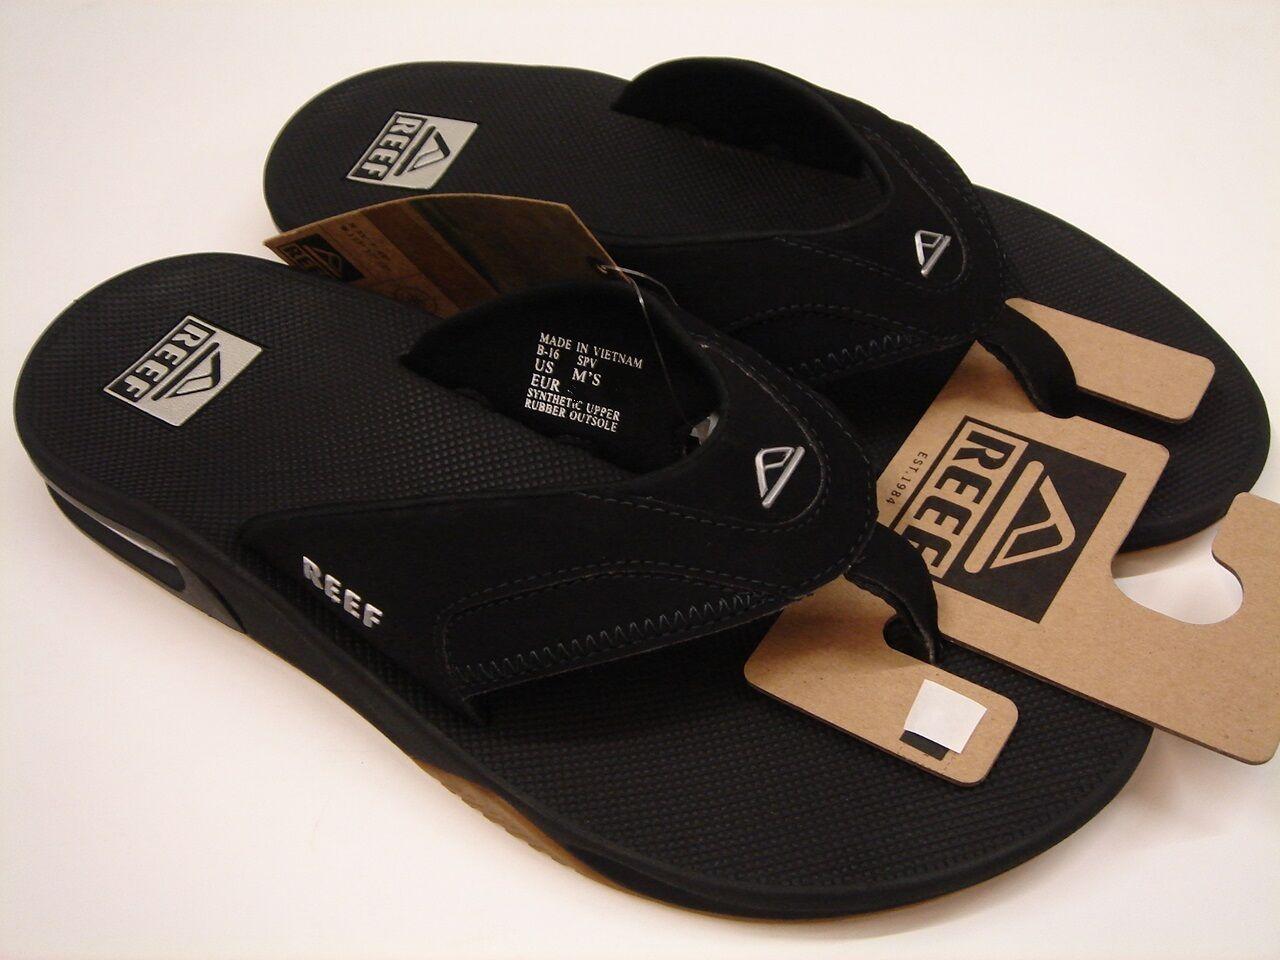 93dbaed16d69 Reef Fanning Sandals Rf002415 Black Silver Mens US Size 10 UK 9 for sale  online